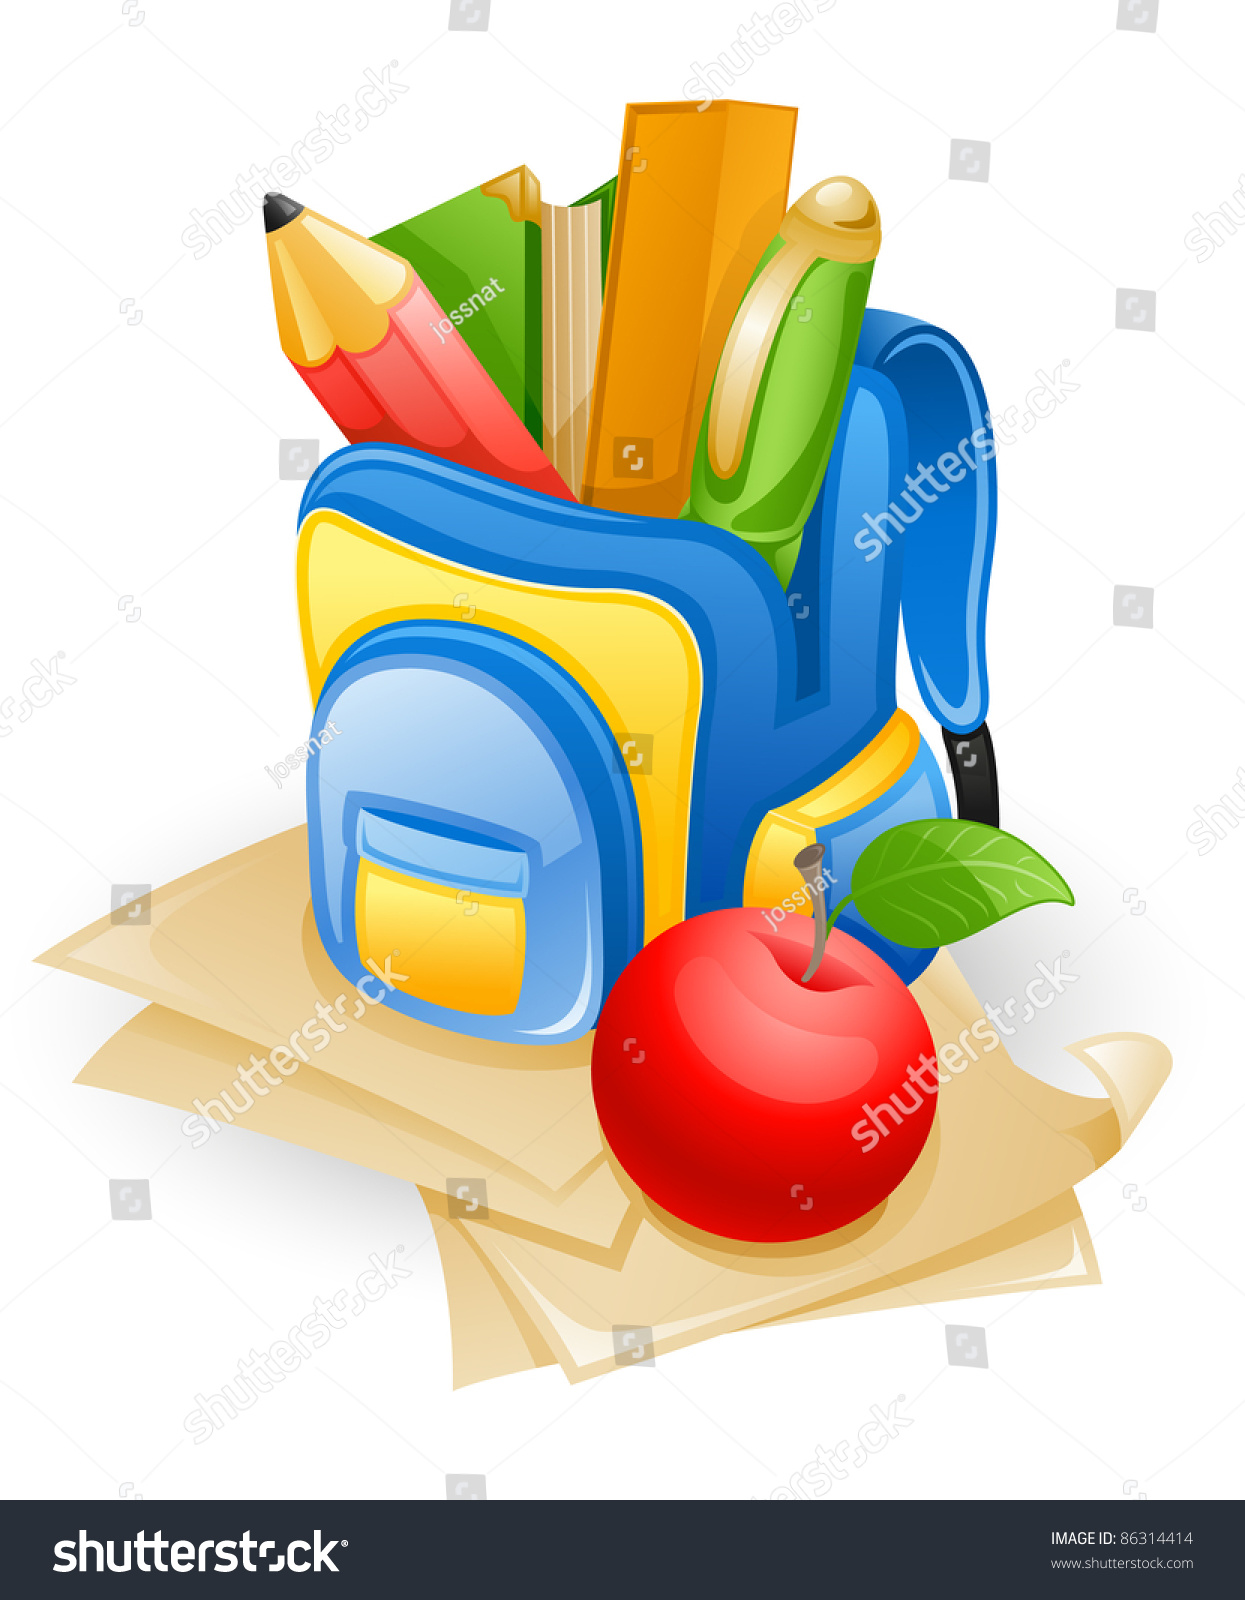 School bag diagram - School Bag Pencil Book Pen Ruler And Apple On Paper